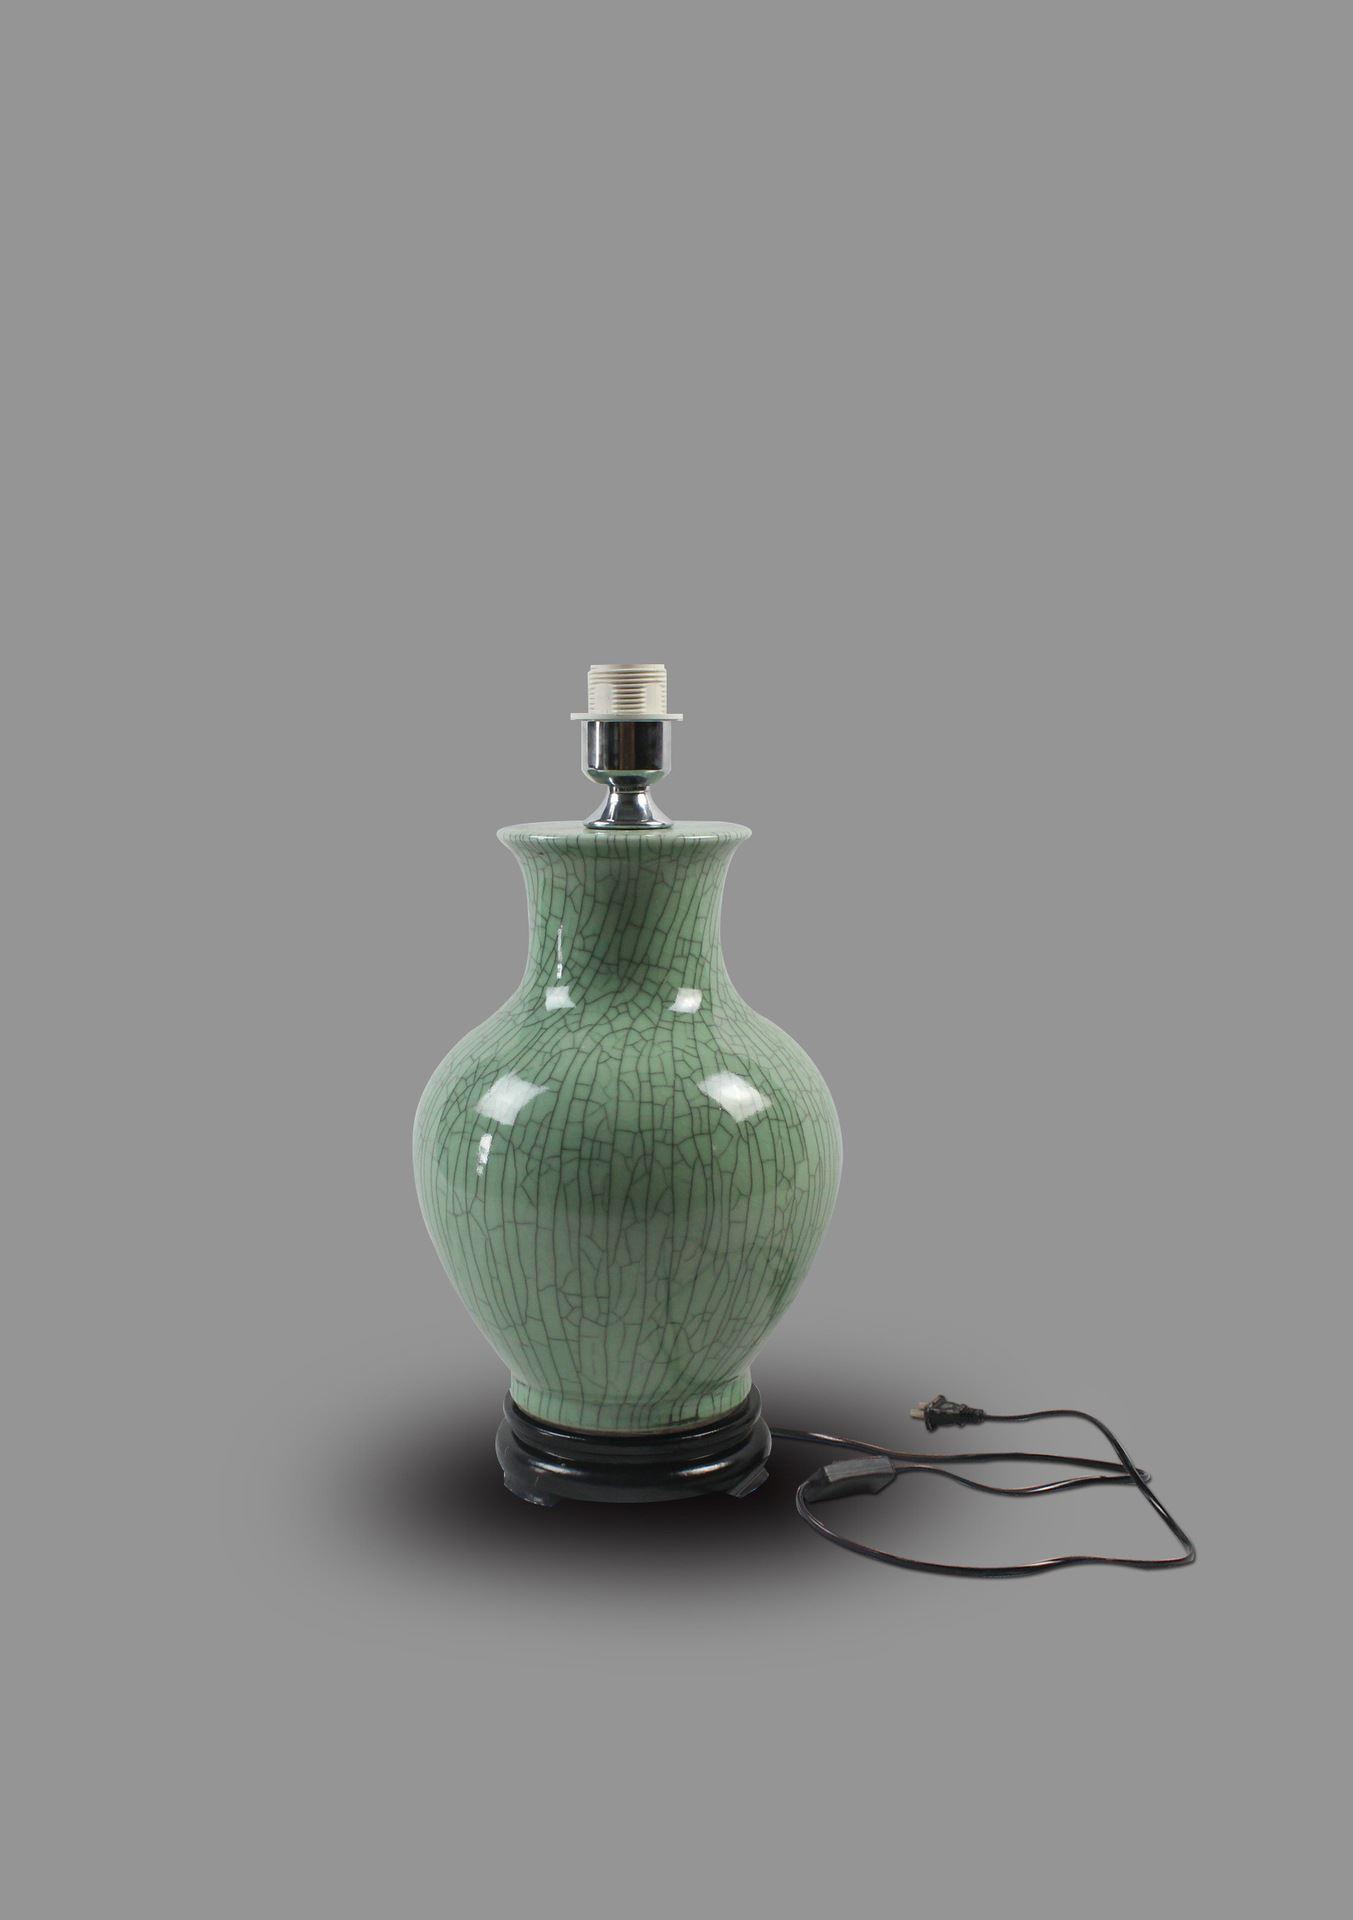 DSIF09景德镇 陶瓷 绿釉开片矮冬瓜 台灯 灯具 灯饰 家居摆设